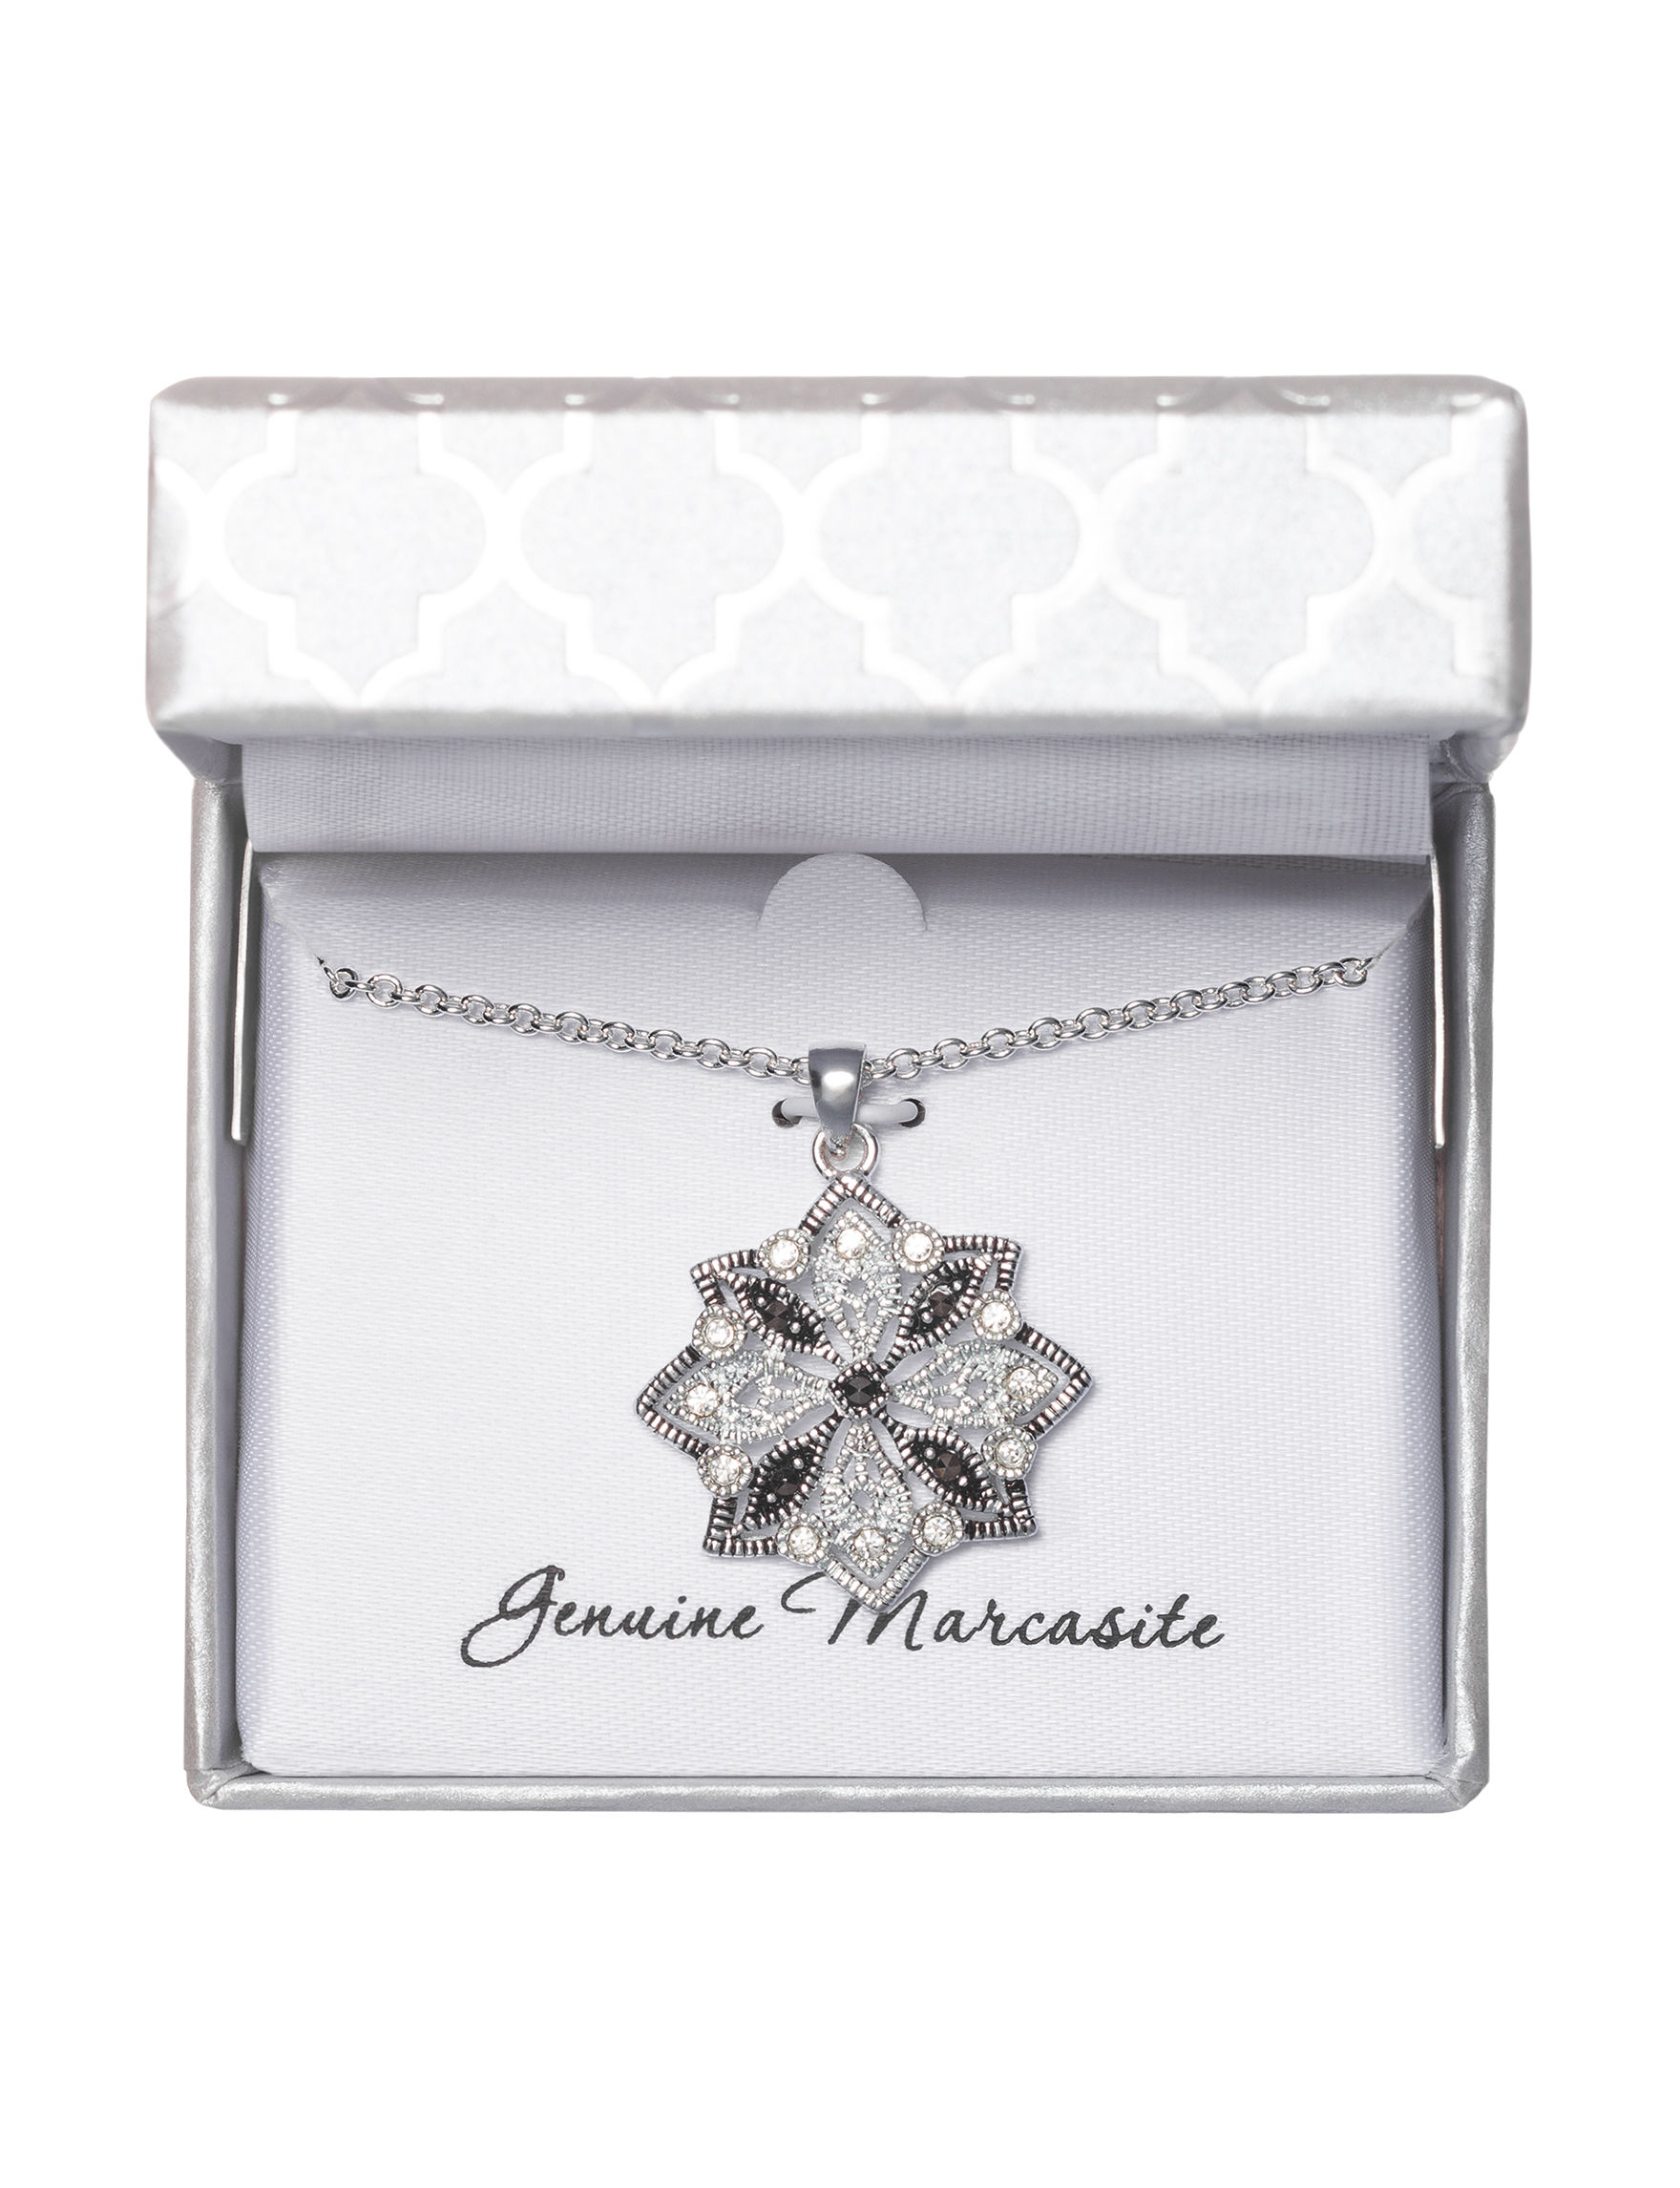 Marsala Black / Silver Necklaces & Pendants Fine Jewelry